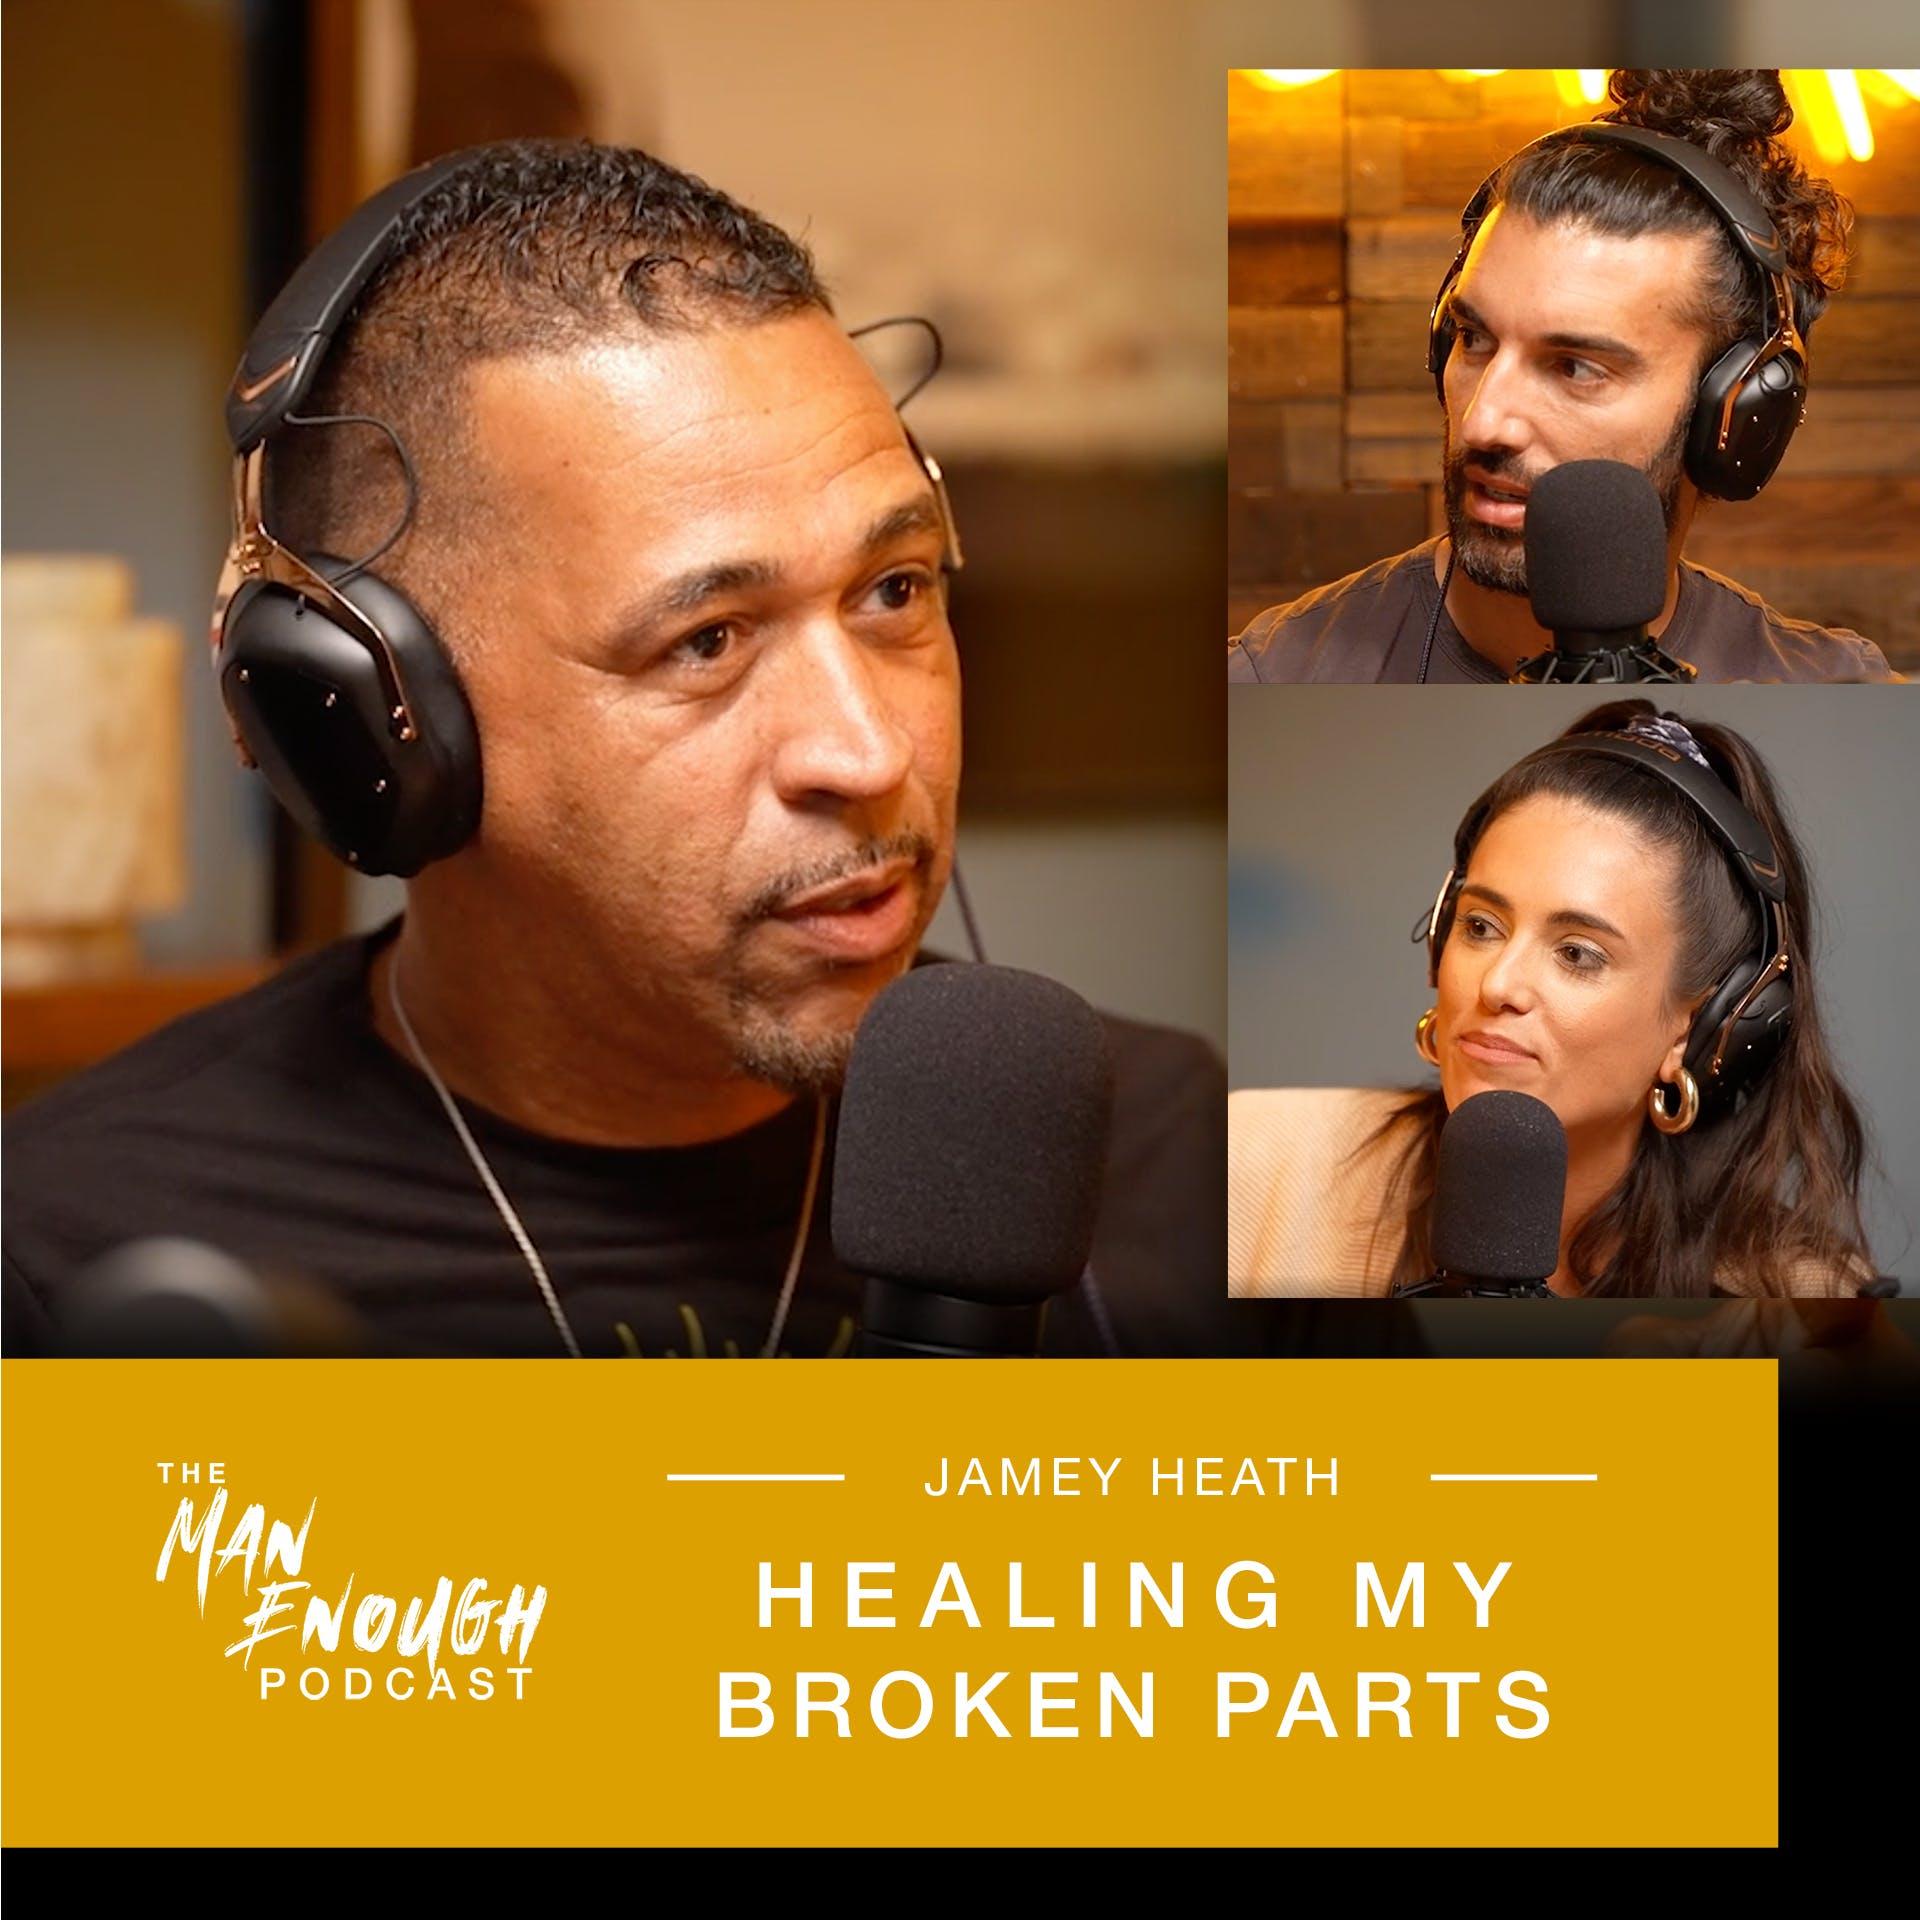 Jamey Heath: Healing My Broken Parts